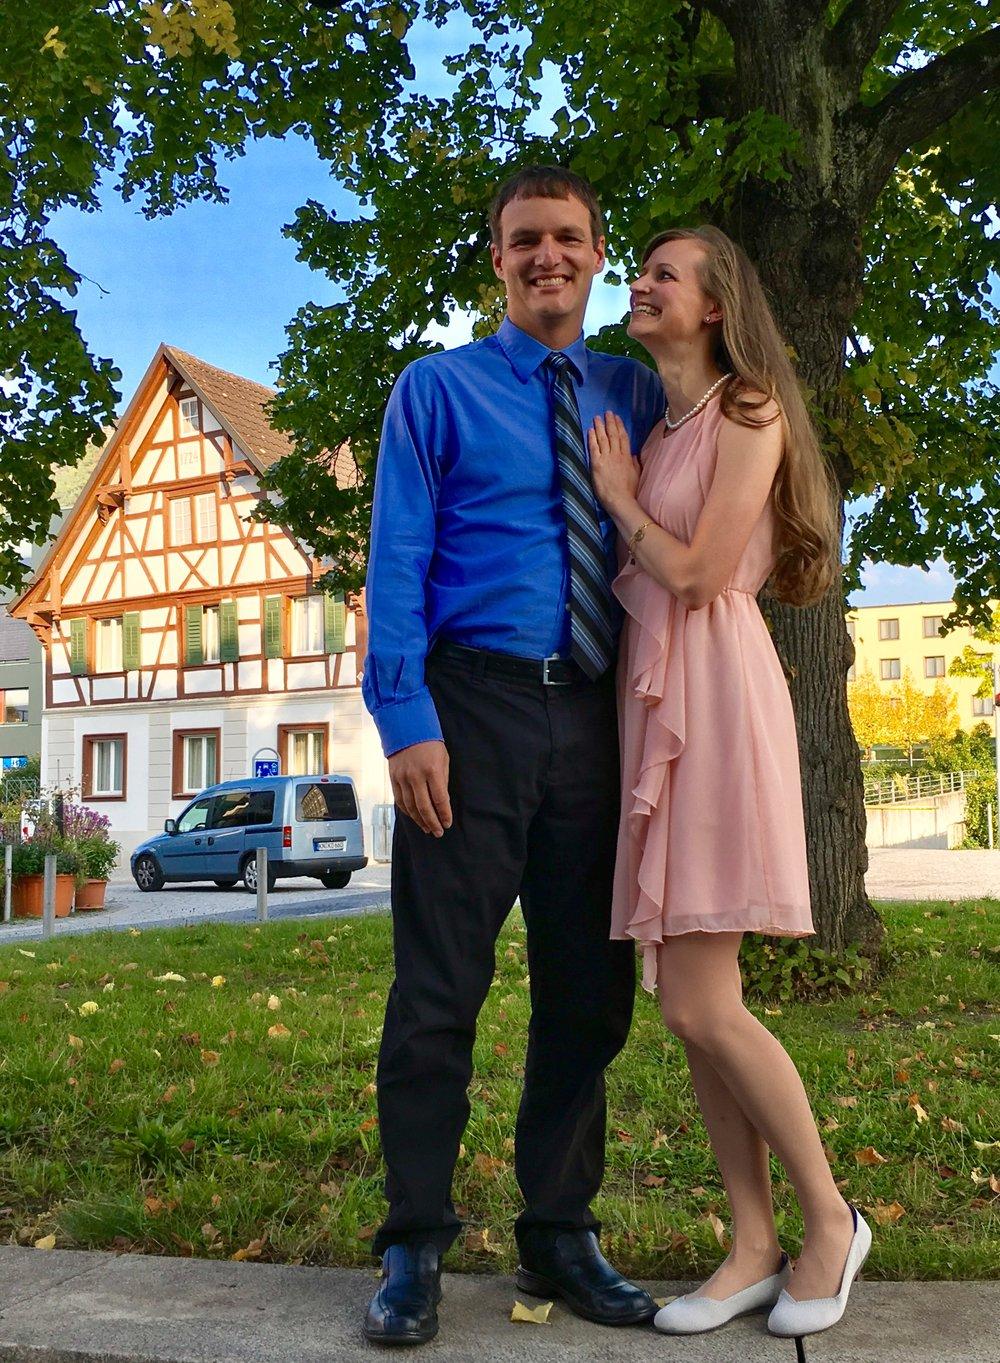 Brian & Sandra's Wedding in Germany, September 2017